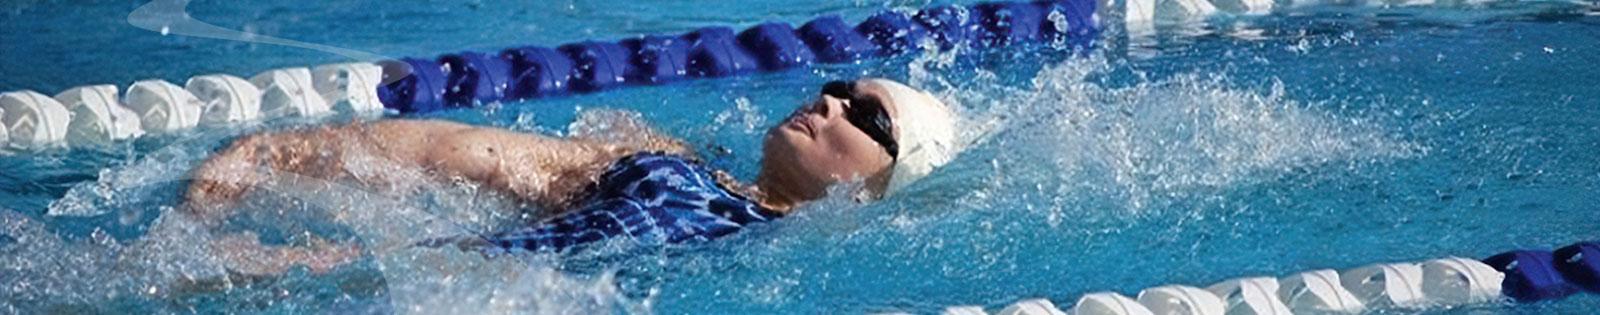 Bellingham Athletic Club - Bellingham Swimming